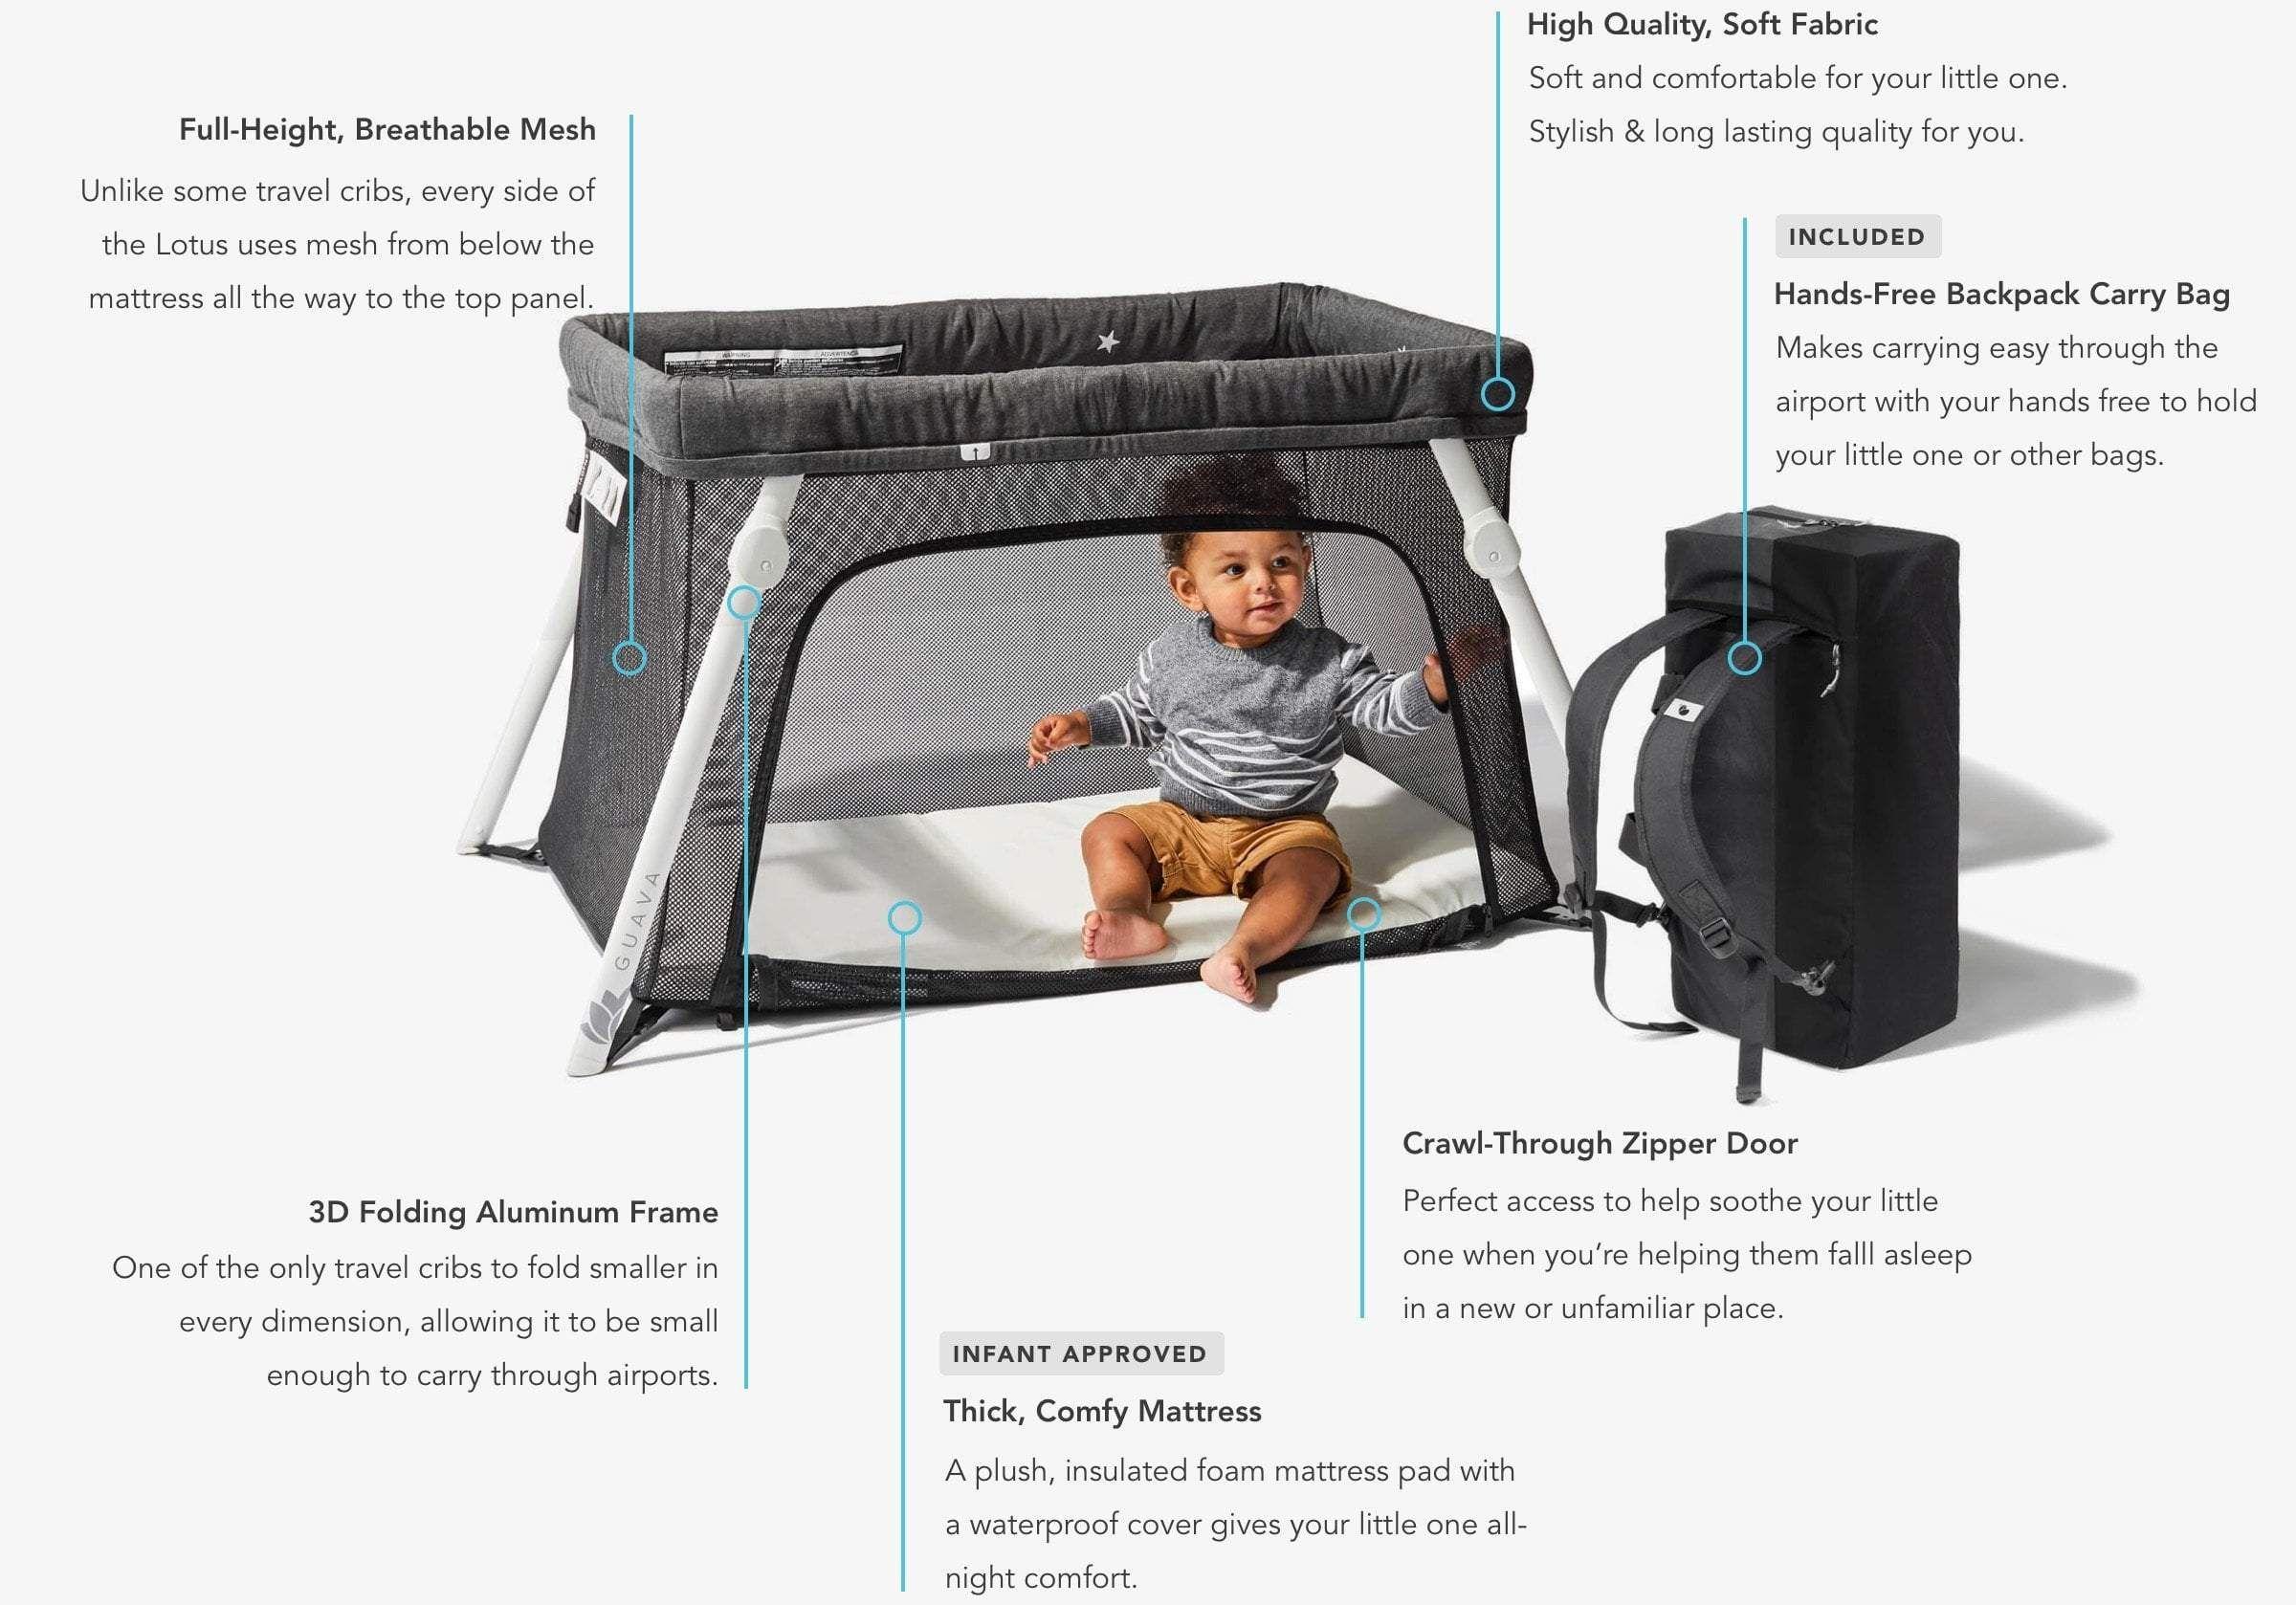 Lotus Everywhere Travel Crib Travel Crib Pack And Play Mattress Cribs